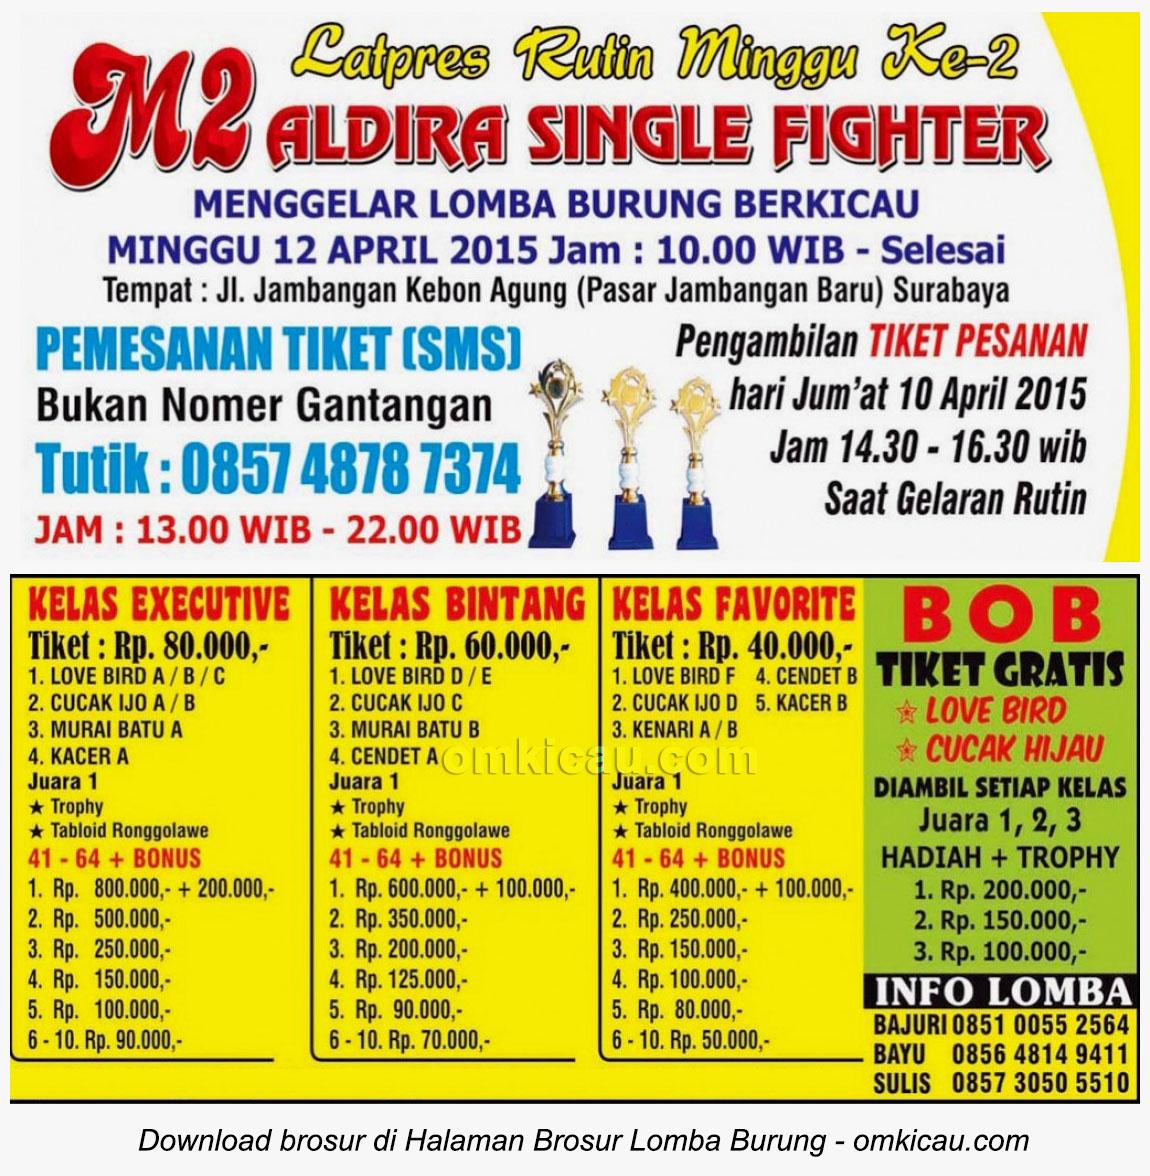 Brosur Latpres Aldira Single Fighter, Surabaya, 12 April 2015